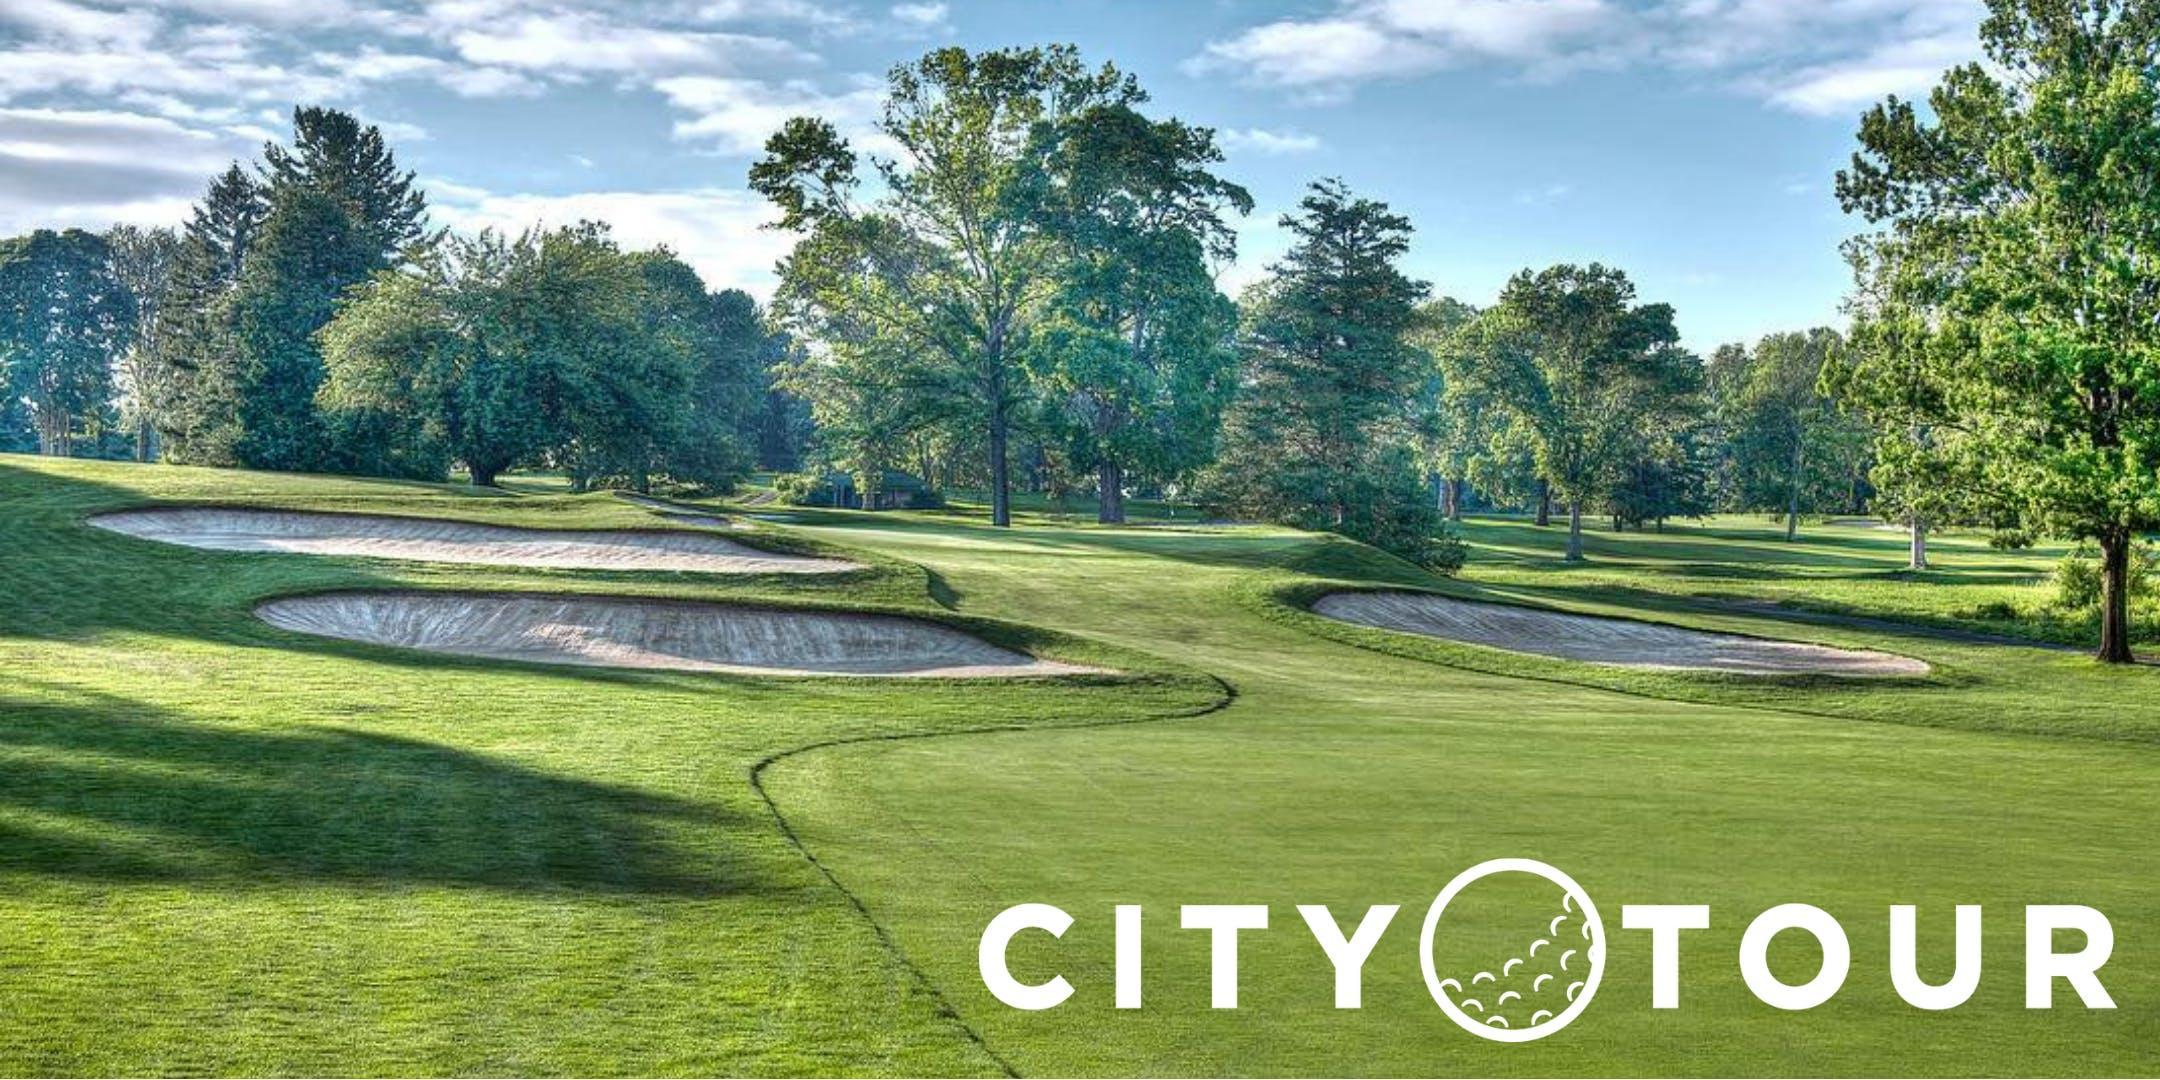 Raleigh City Tour - Devil's Ridge Golf Club